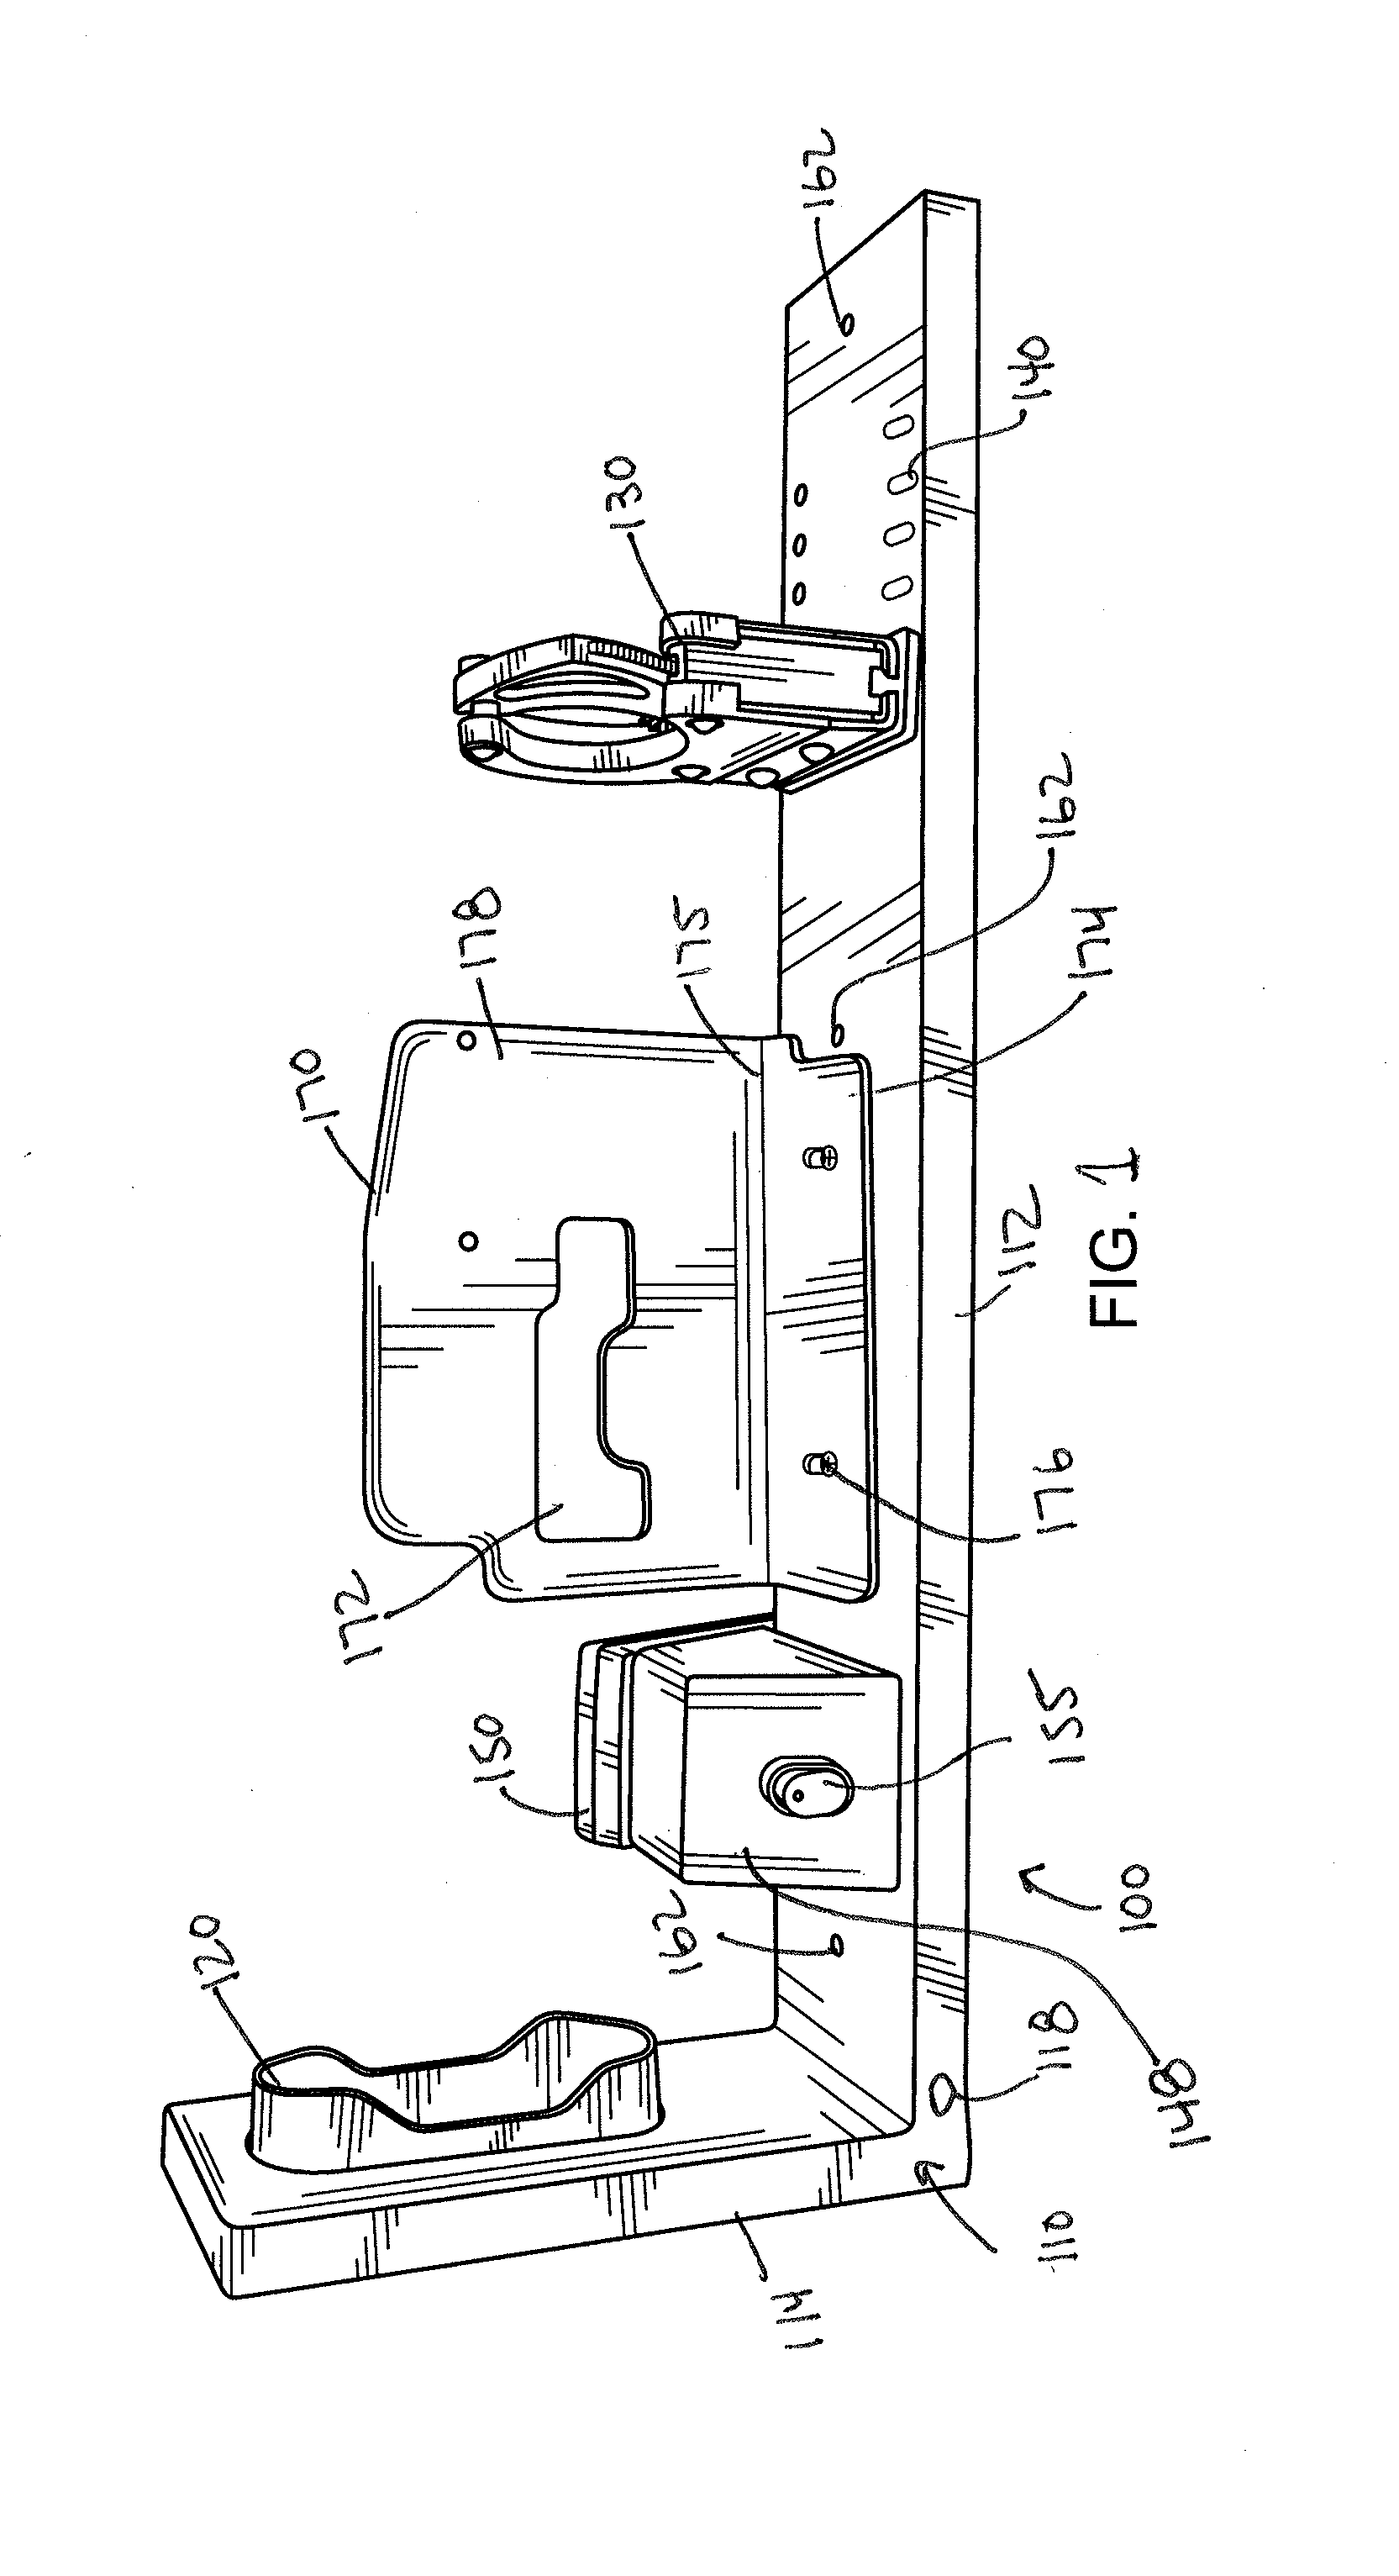 US20140263107A1 20140918 D00001 patent us20140263107 locking gun rack system with quick pro gard gun lock timer wiring diagram at reclaimingppi.co